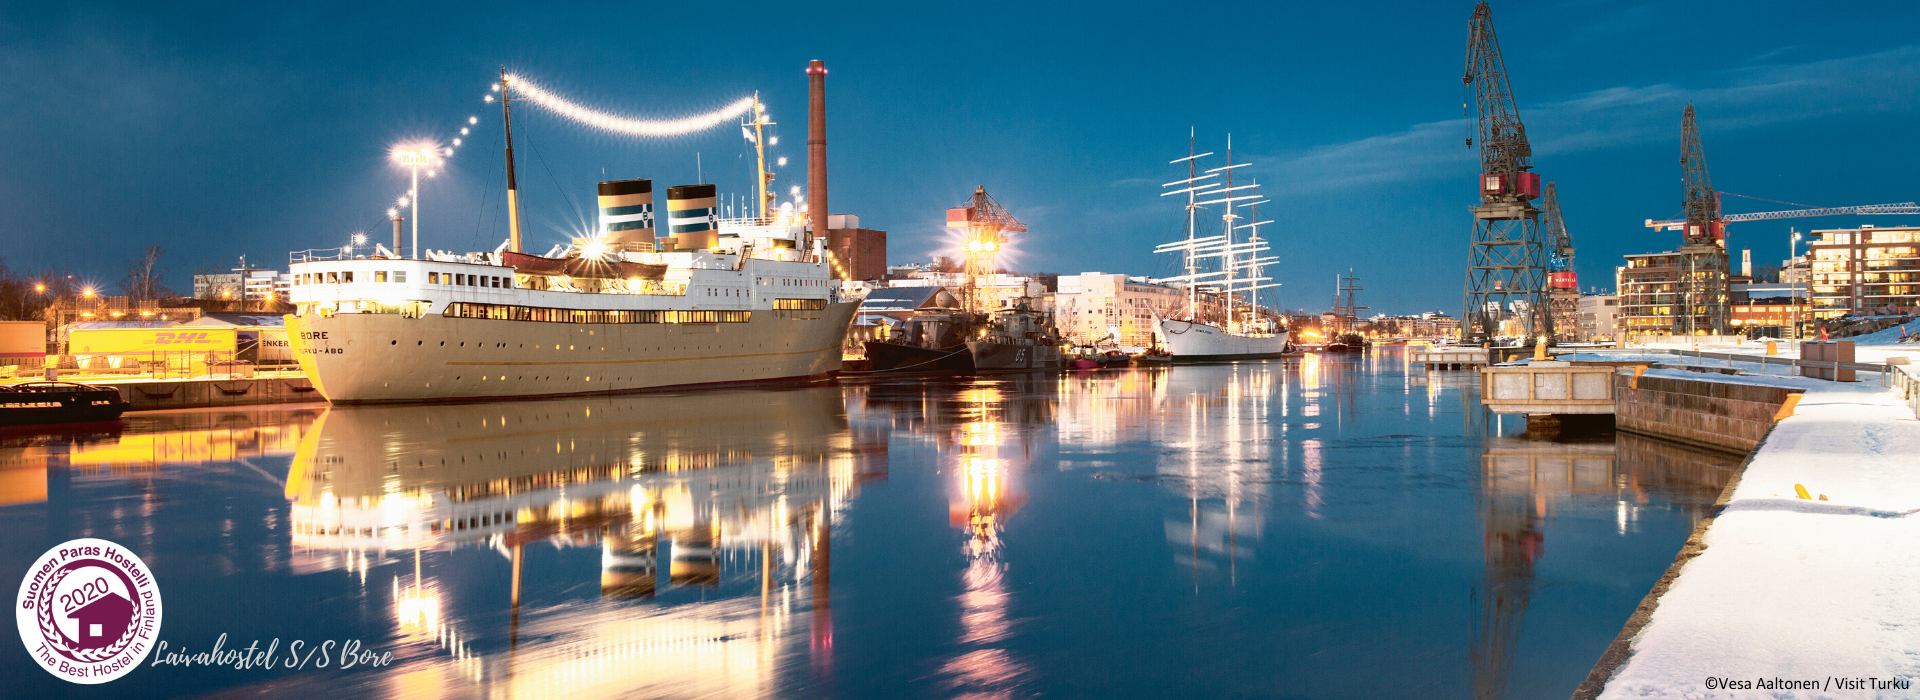 Laivahostel S/S Bore on Suomen Paras Hostelli 2020